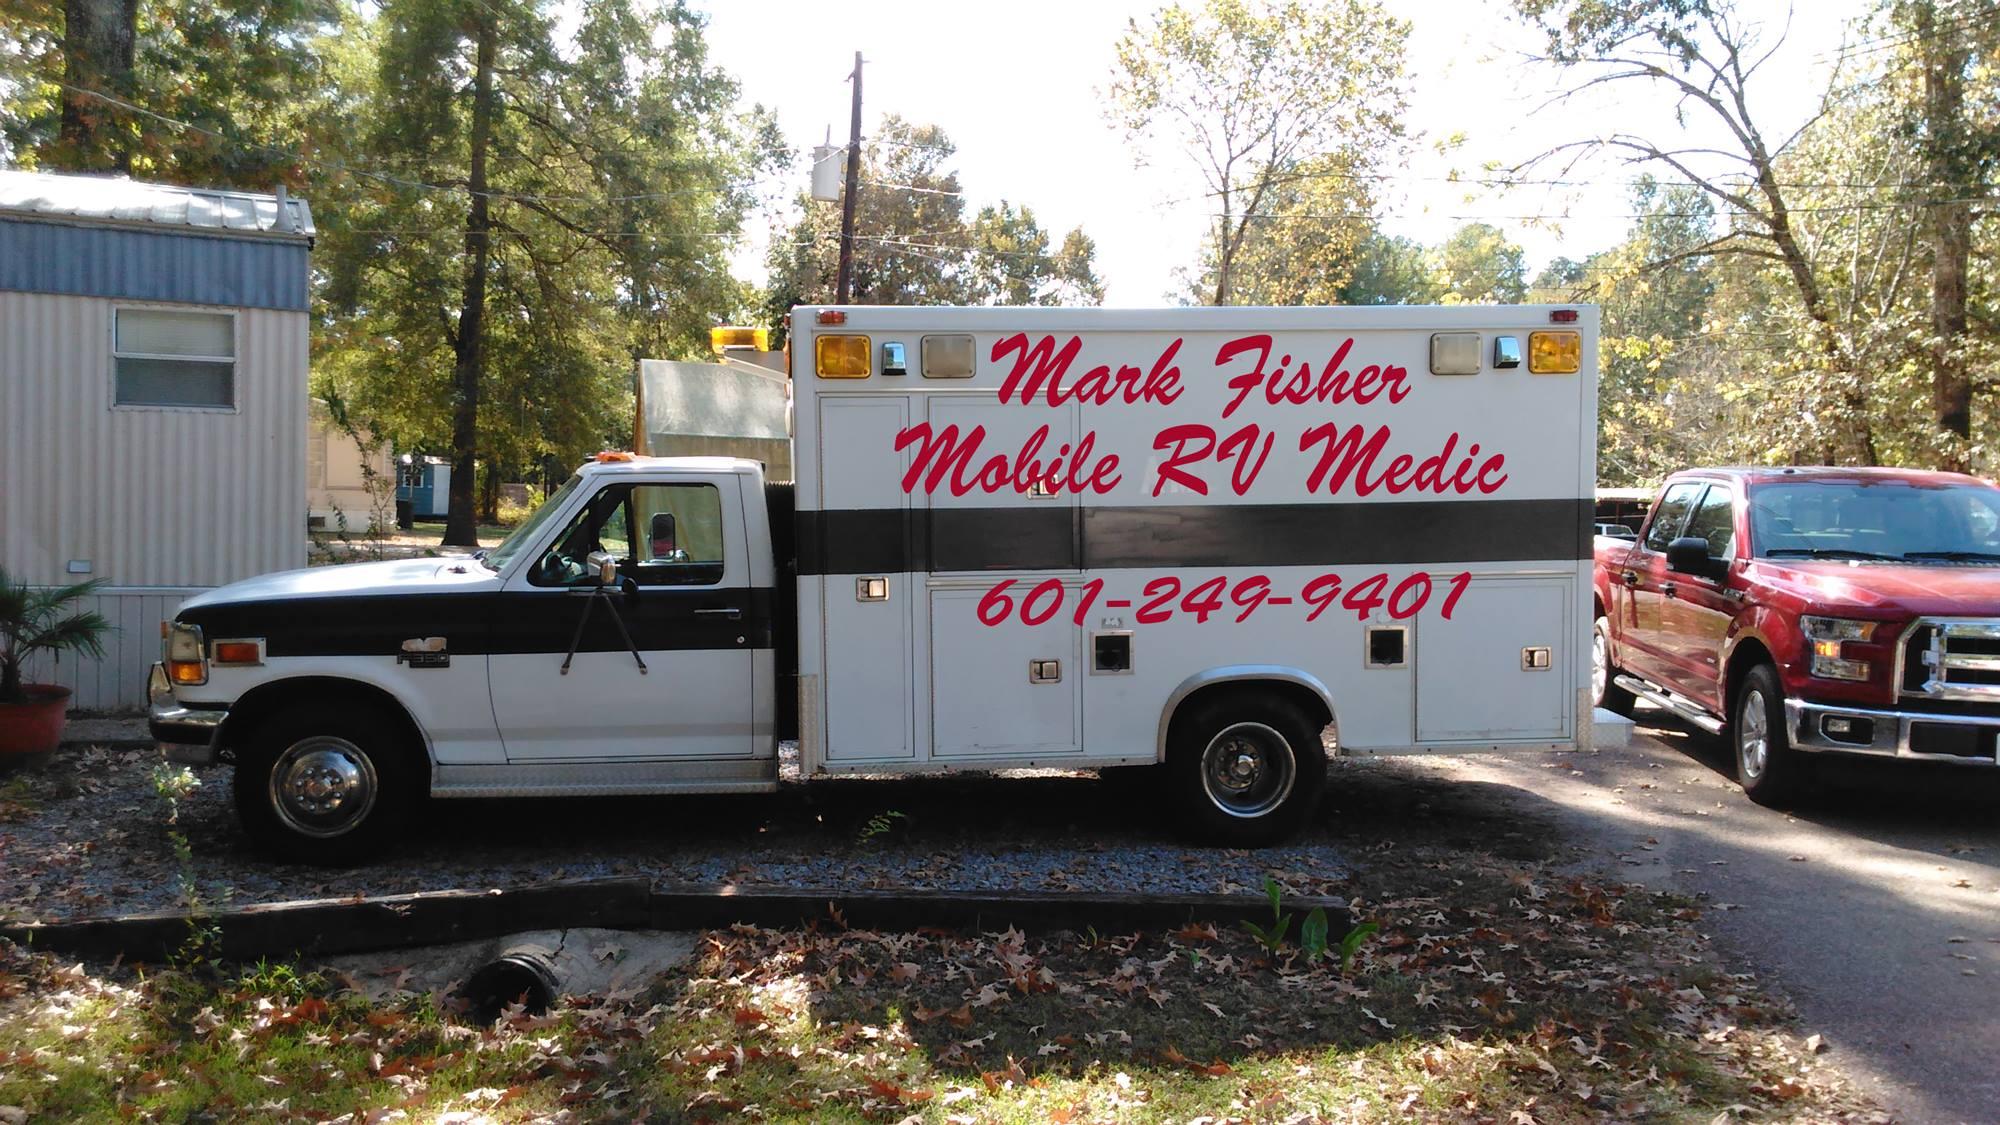 Mark Fisher Mobile Rv Medic Brandon Ms 39047 Yp Com